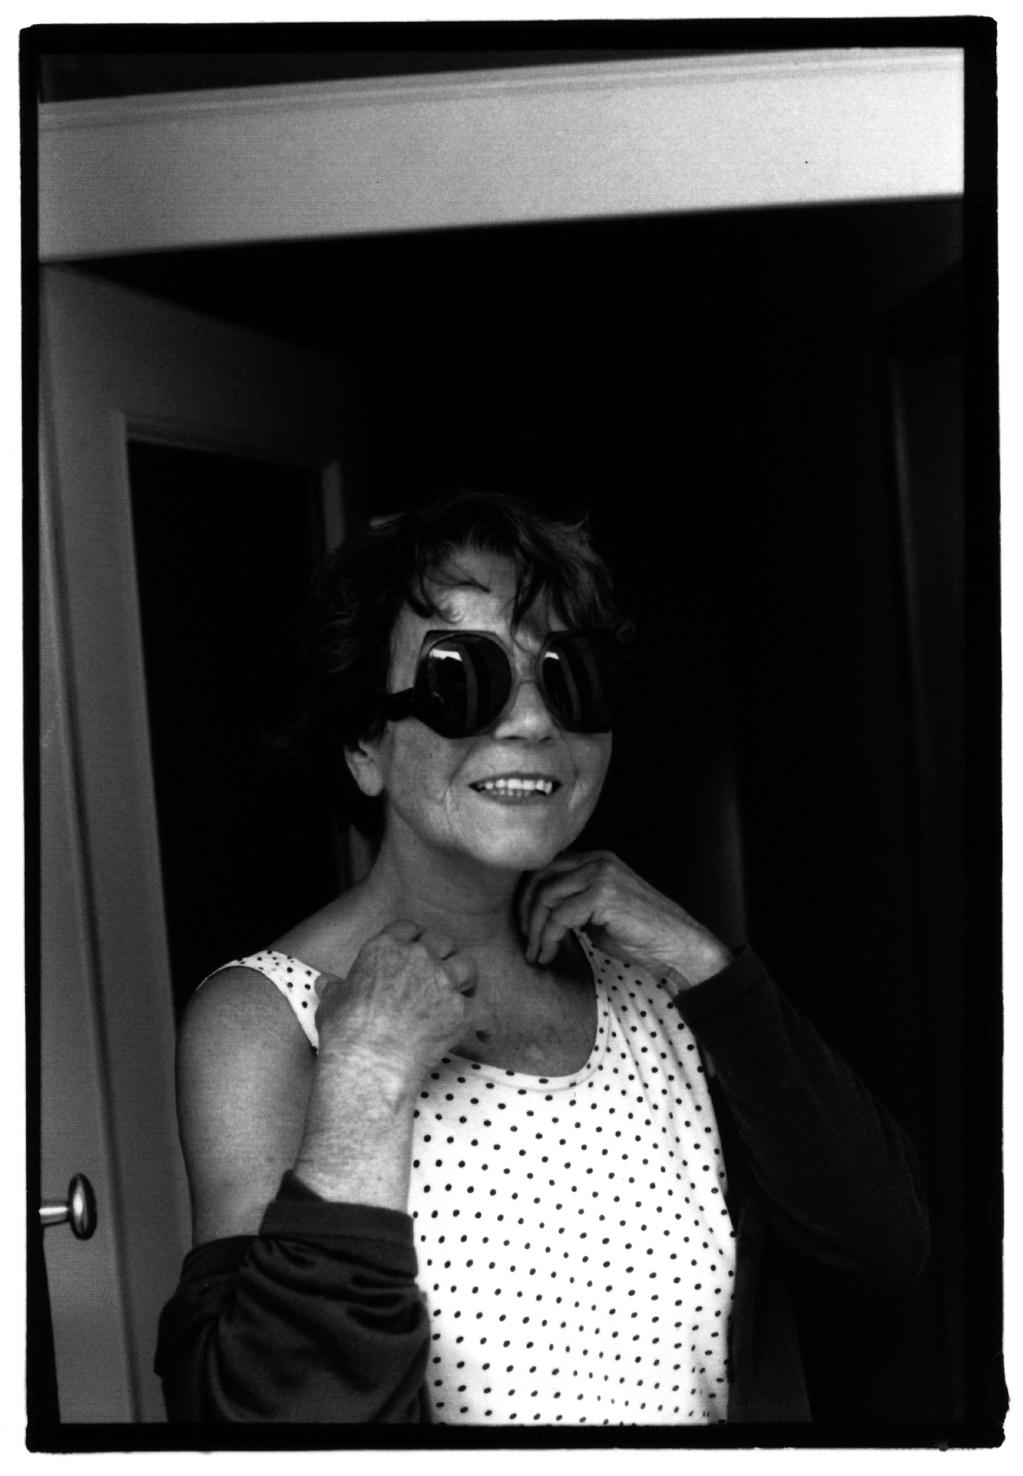 Maria Lassnig, Feistritz, 200. Photo: Sepp Dreissinger